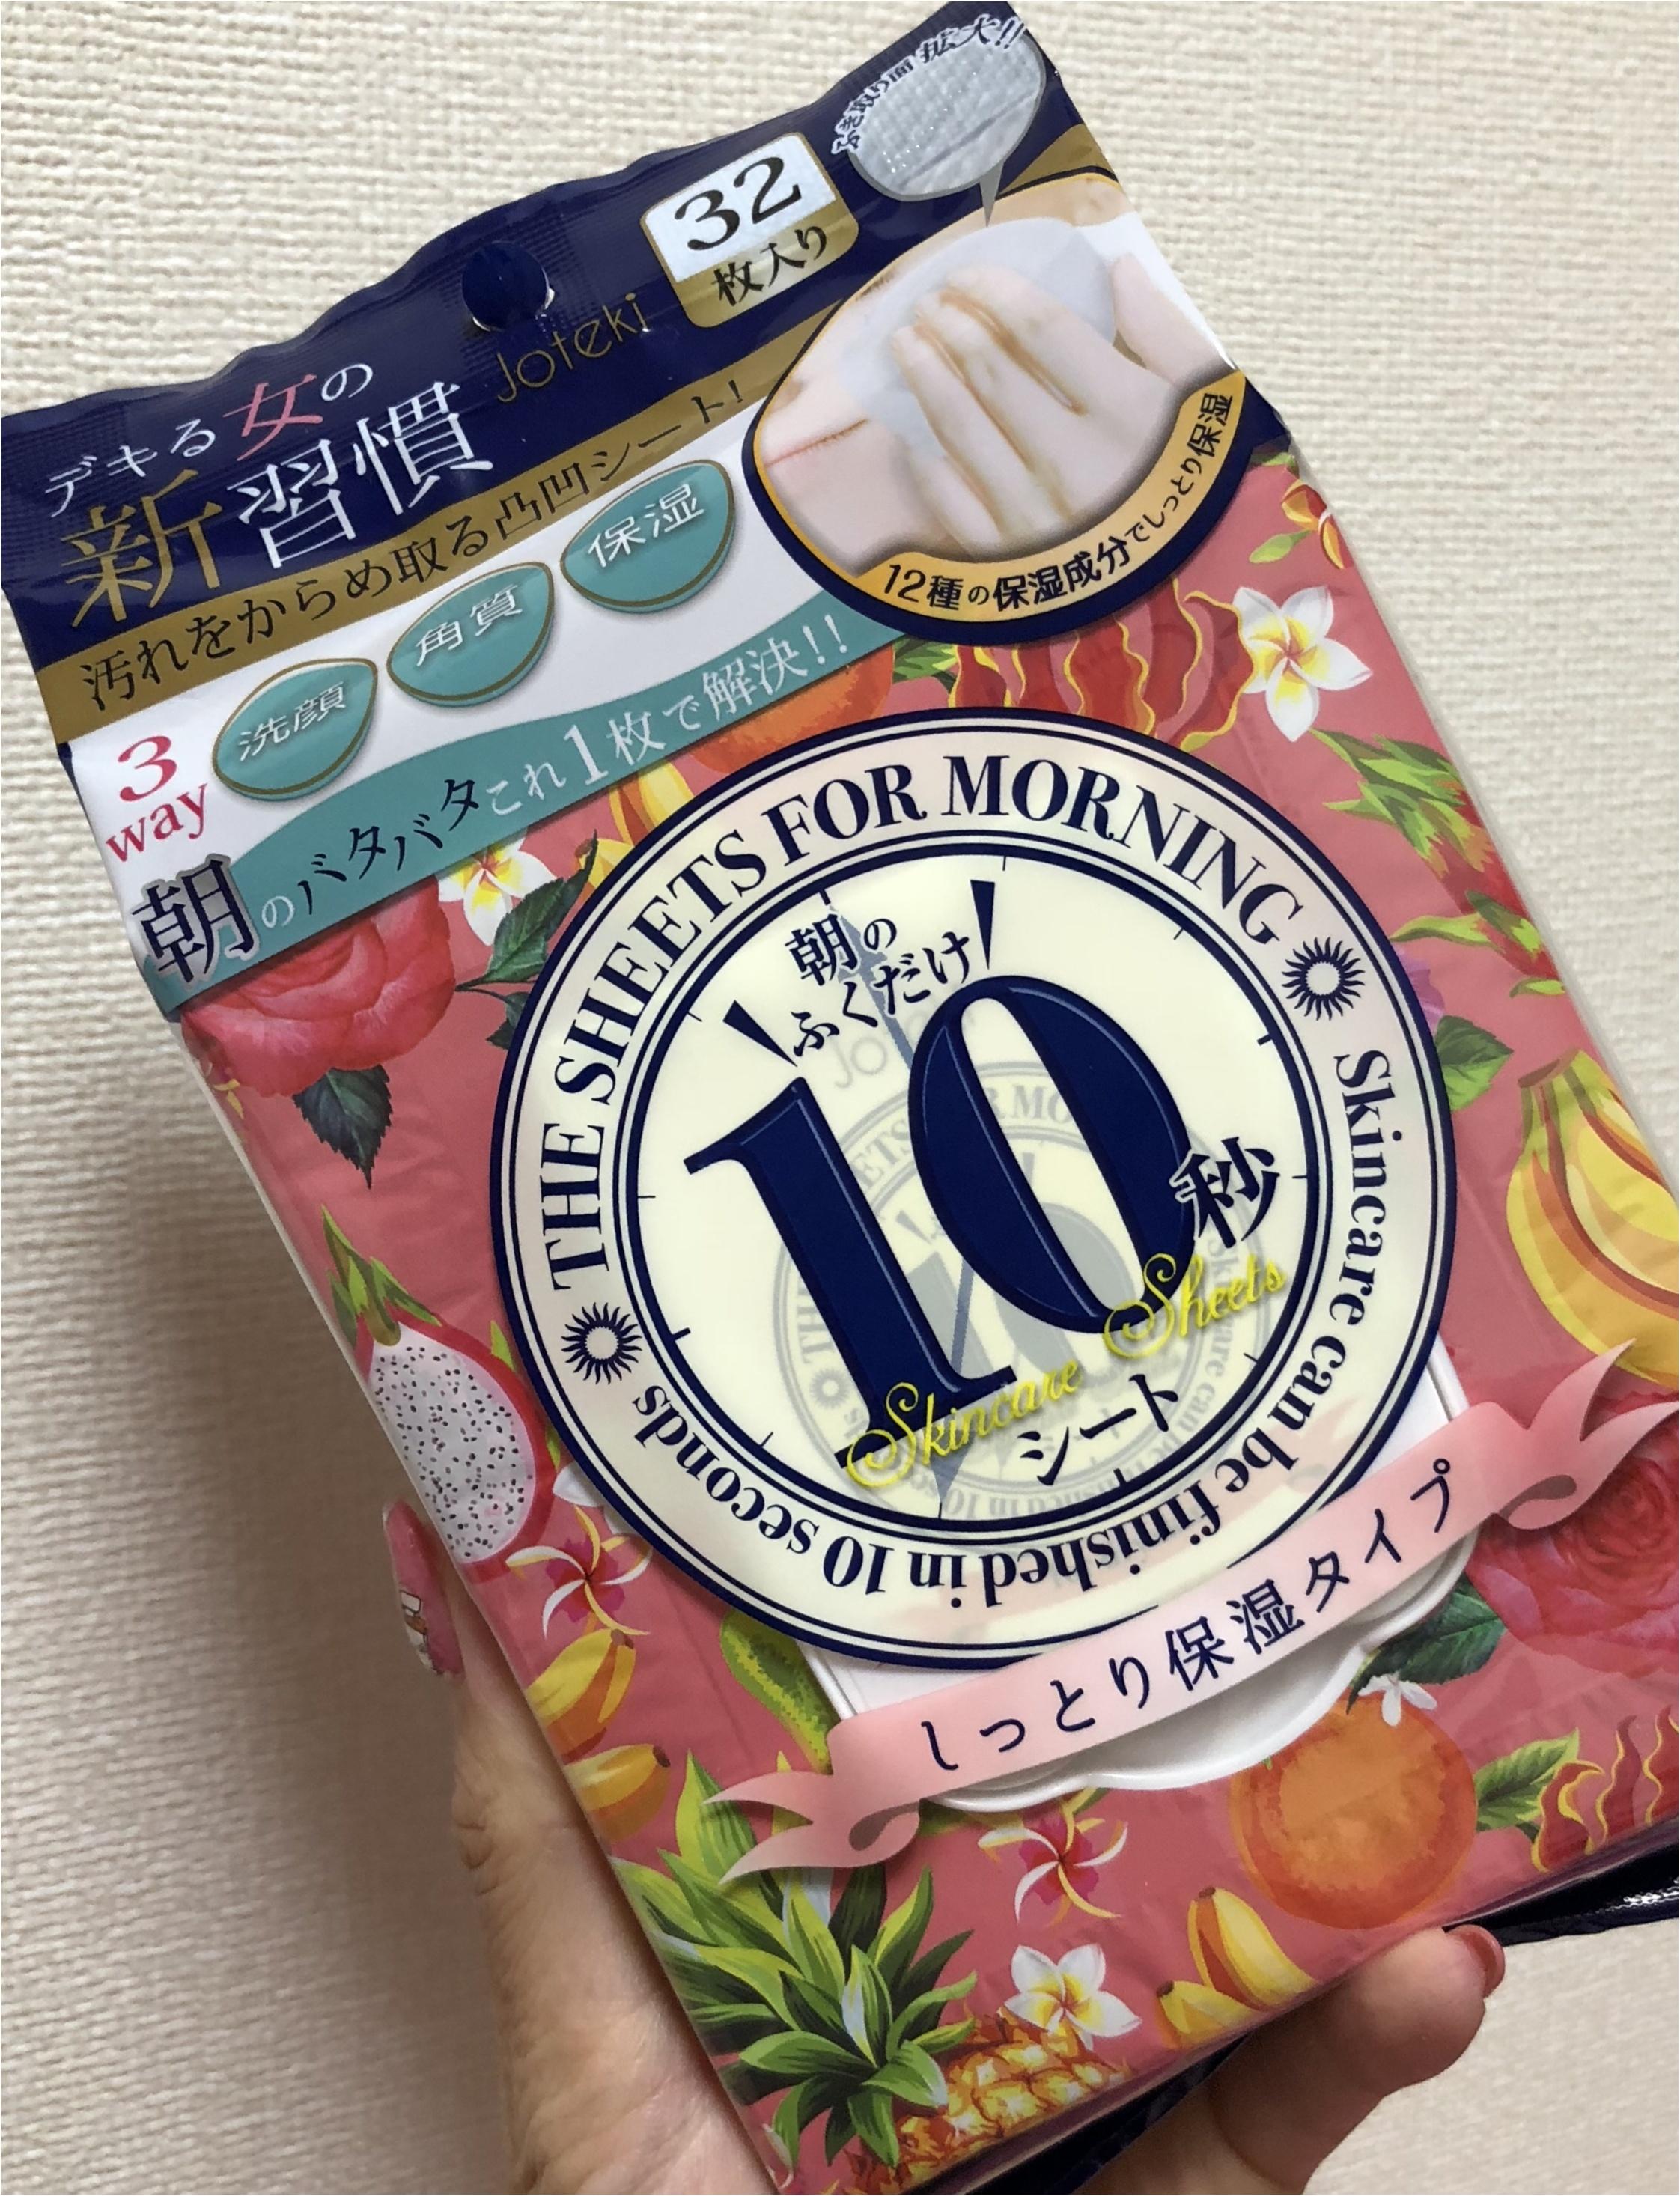 joteki「朝のふくだけ!10秒シート」デキる女の新習慣✨朝のバタバタもこれで解消。シート1枚で時短美容。_3